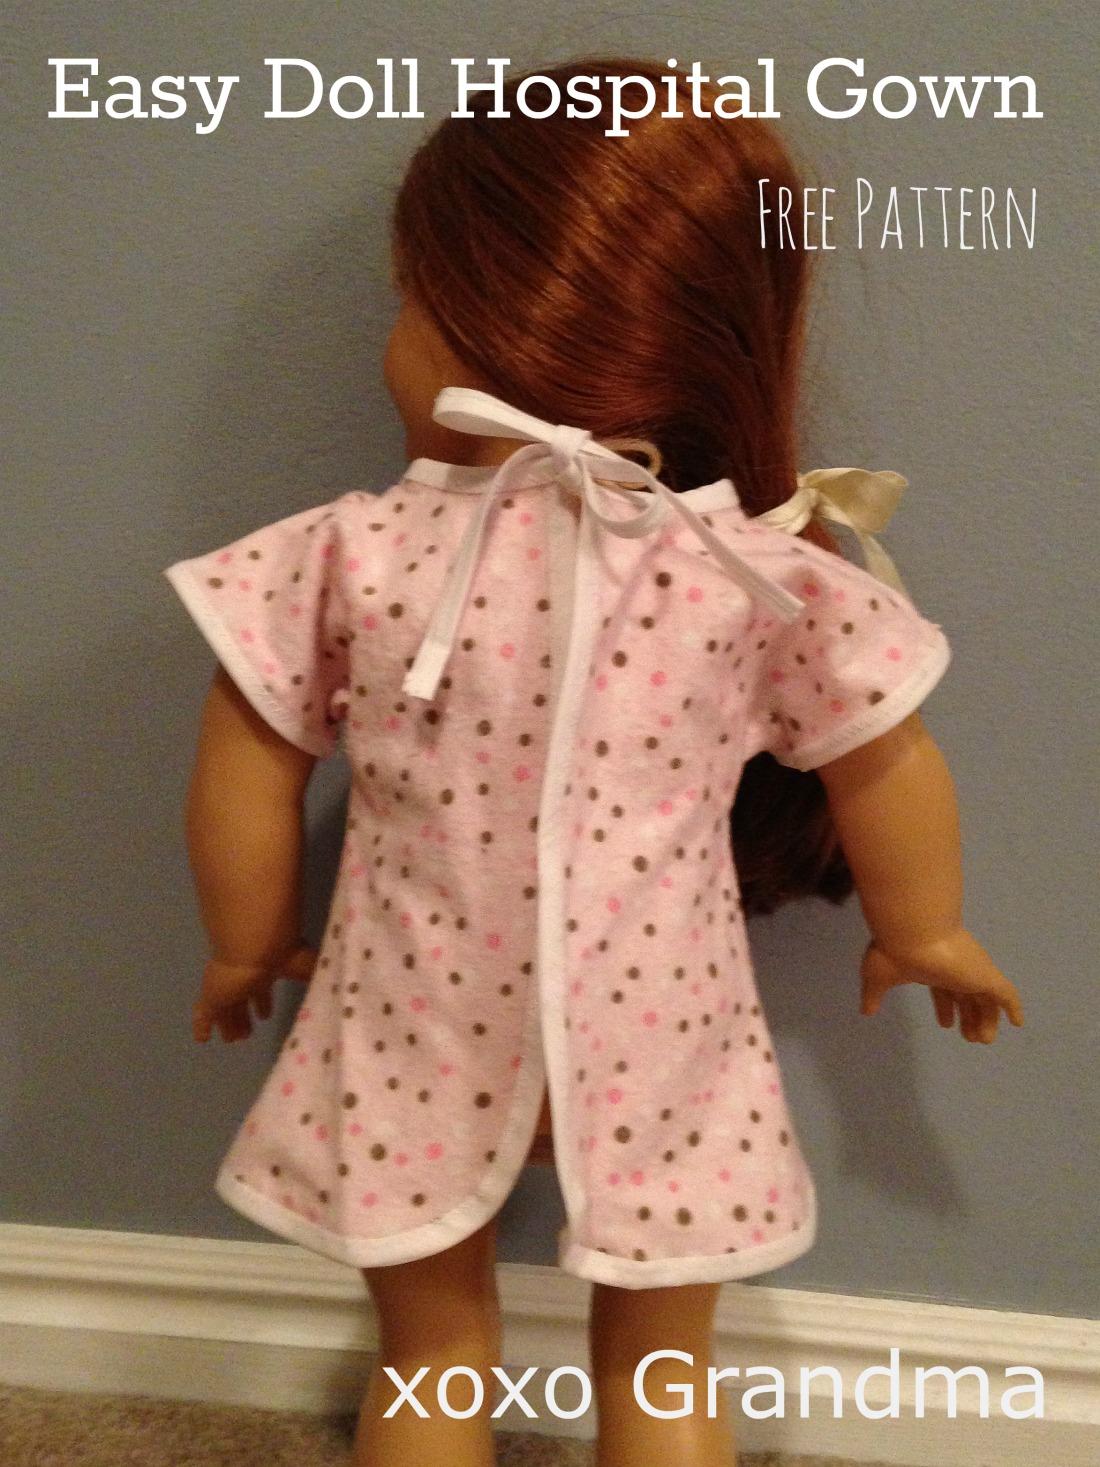 xoxo Grandma: Easy Doll Hospital Gown - a FREE Pattern